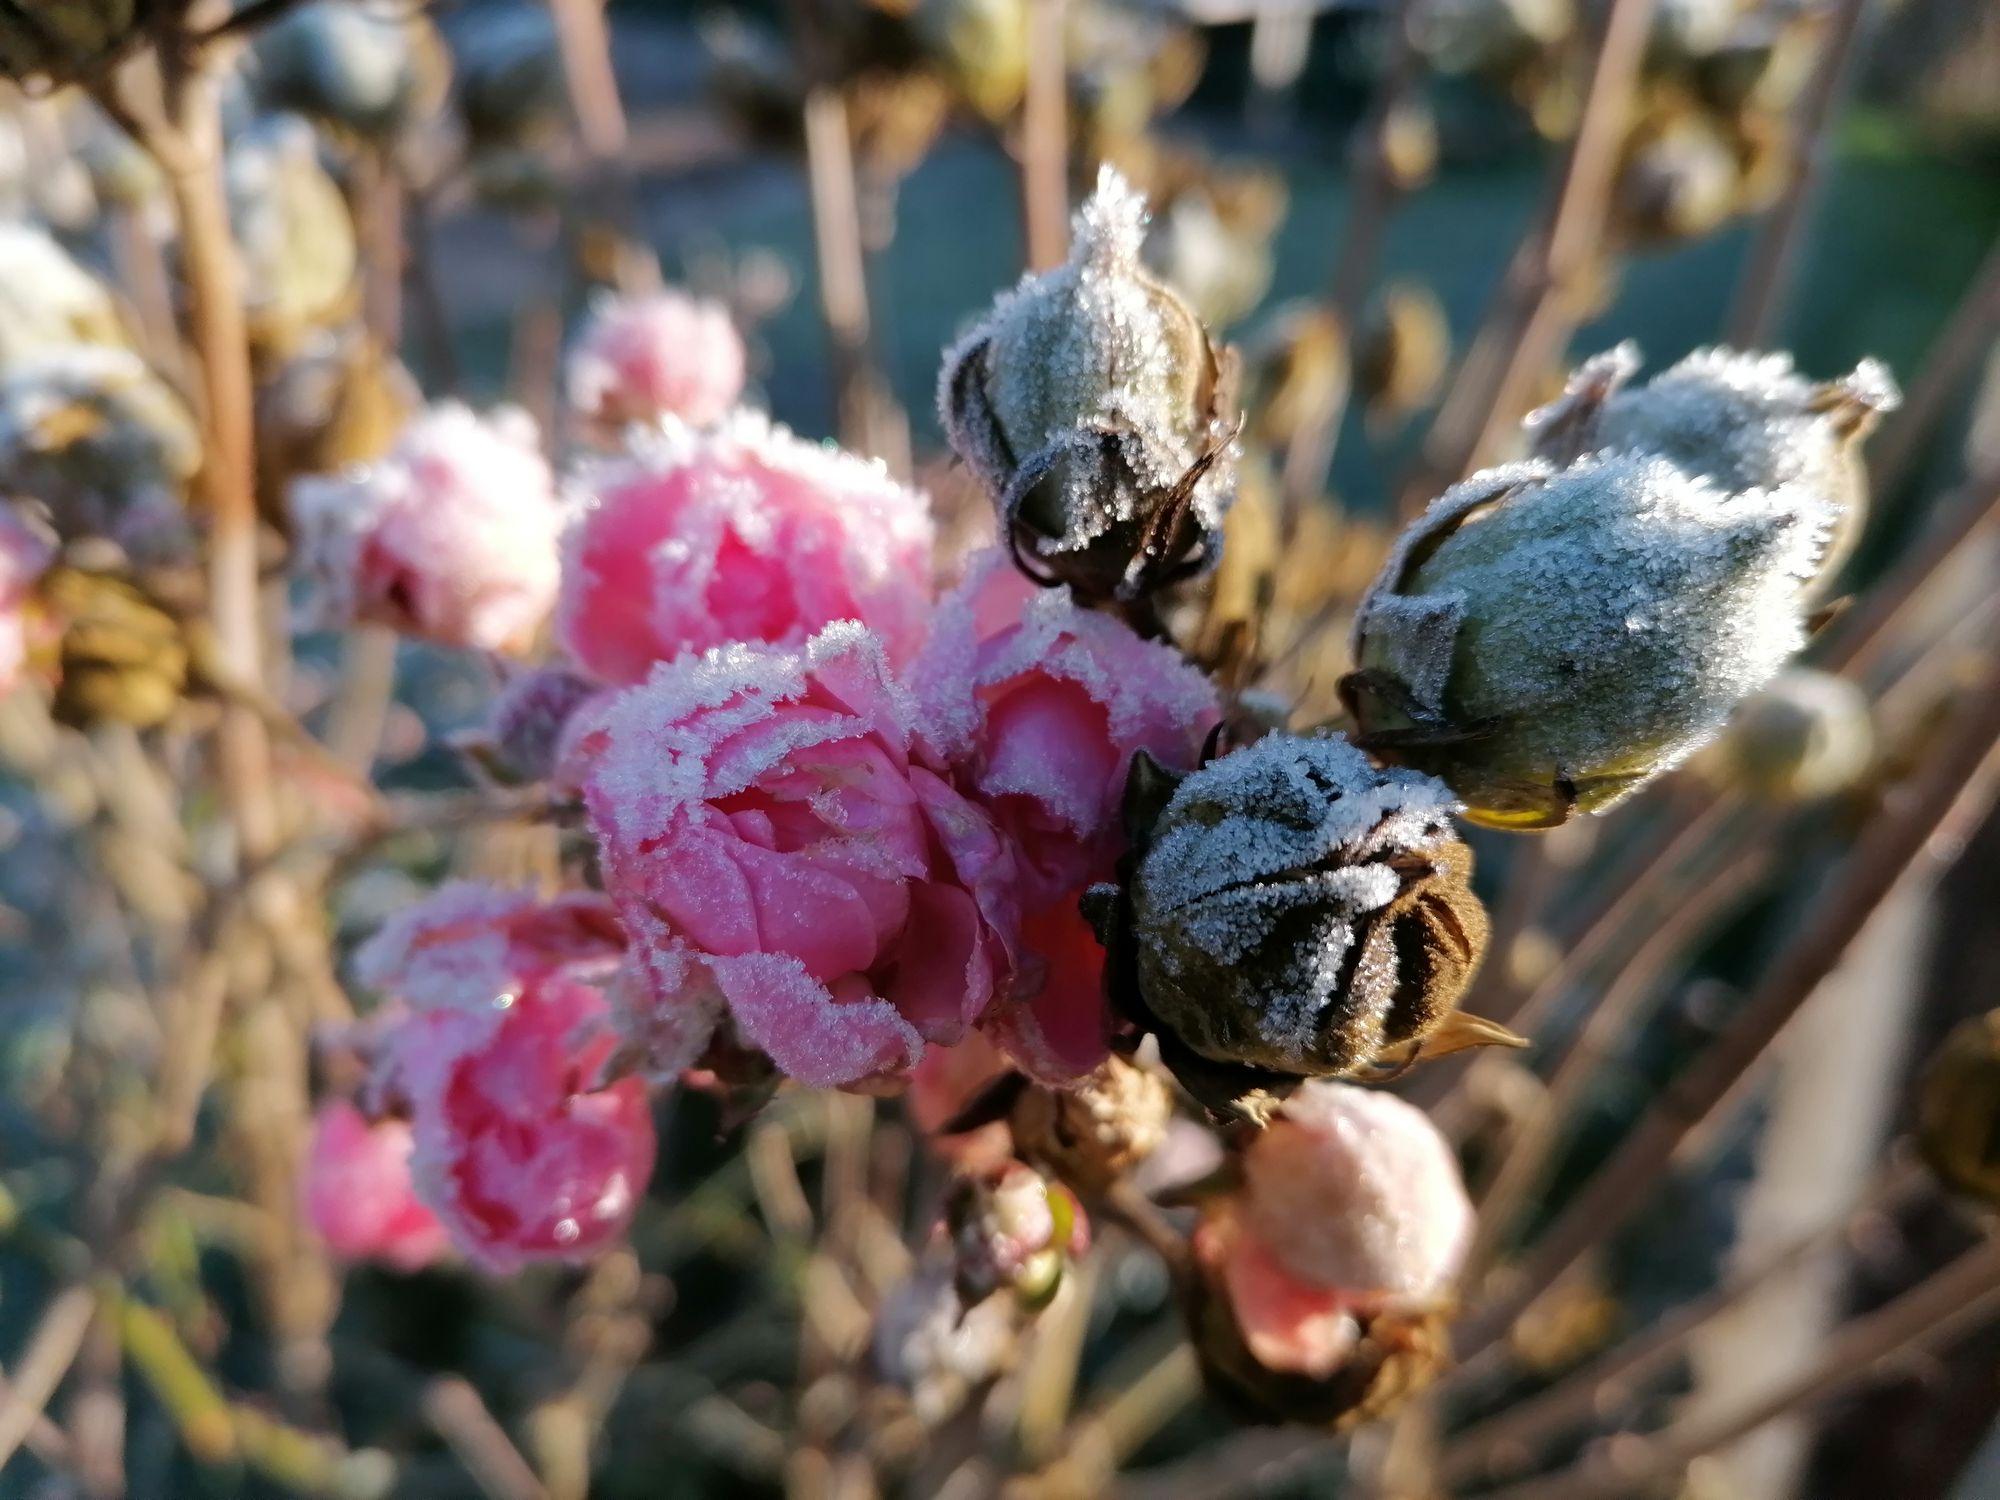 Erster Frost am Sonntag Morgen